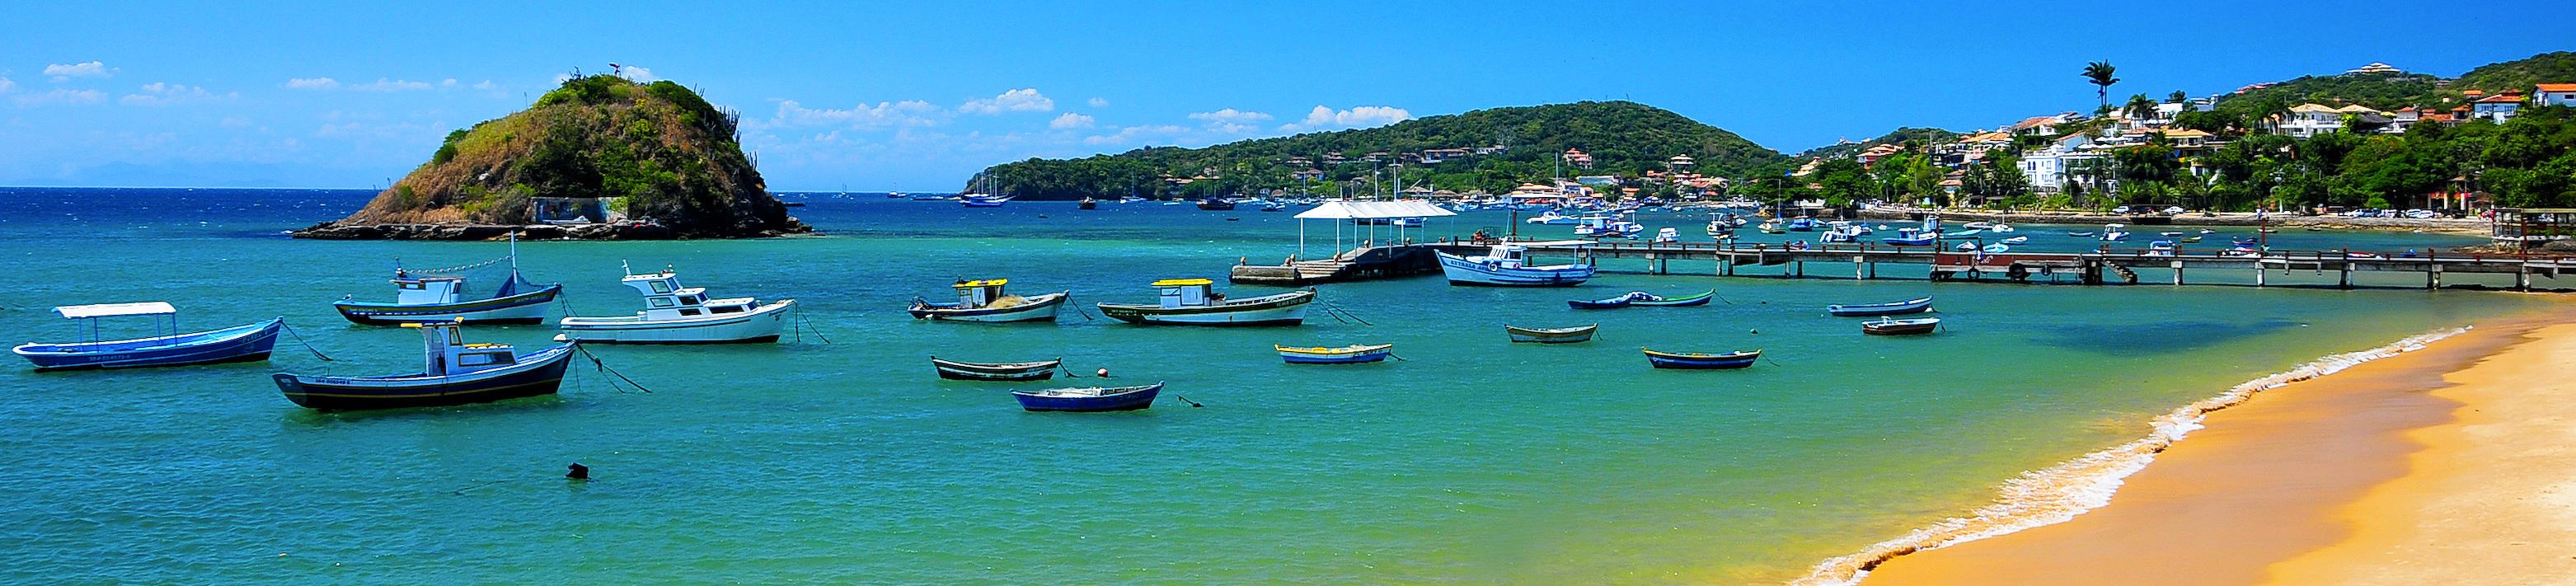 Météo au Brésil